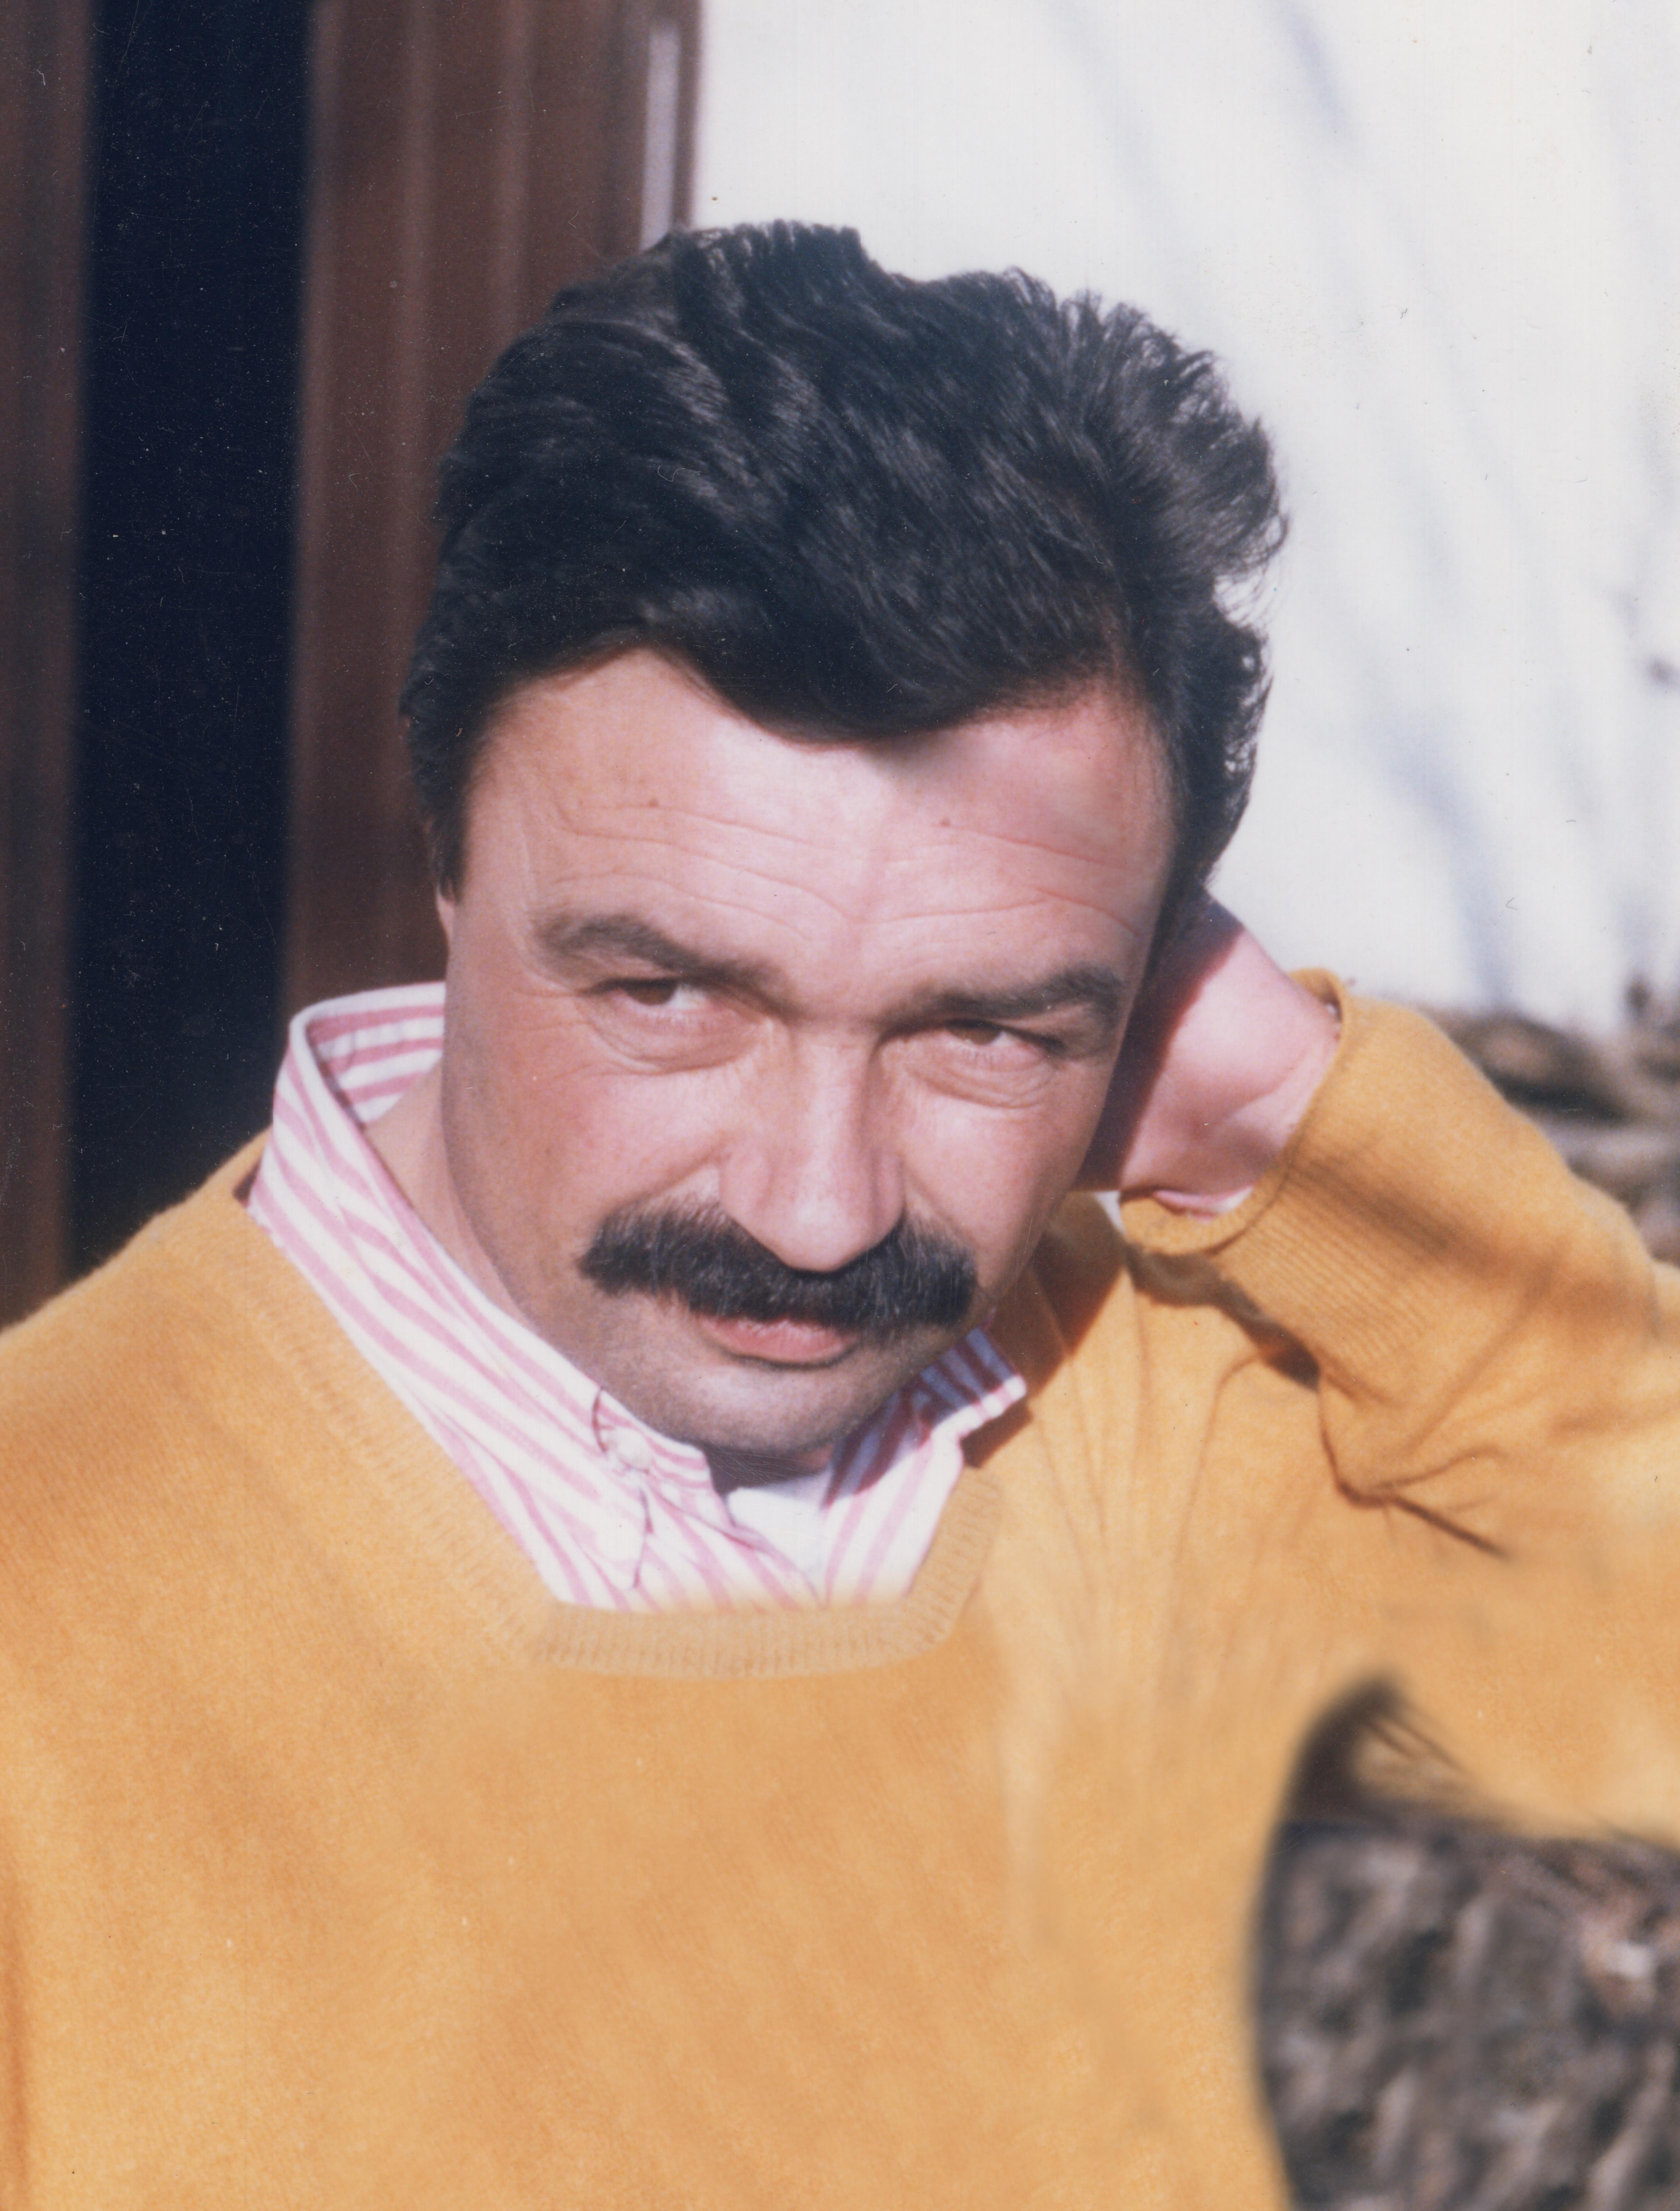 Taffo Onoranze Funebri - Necrologi - Giancarlo Tresca